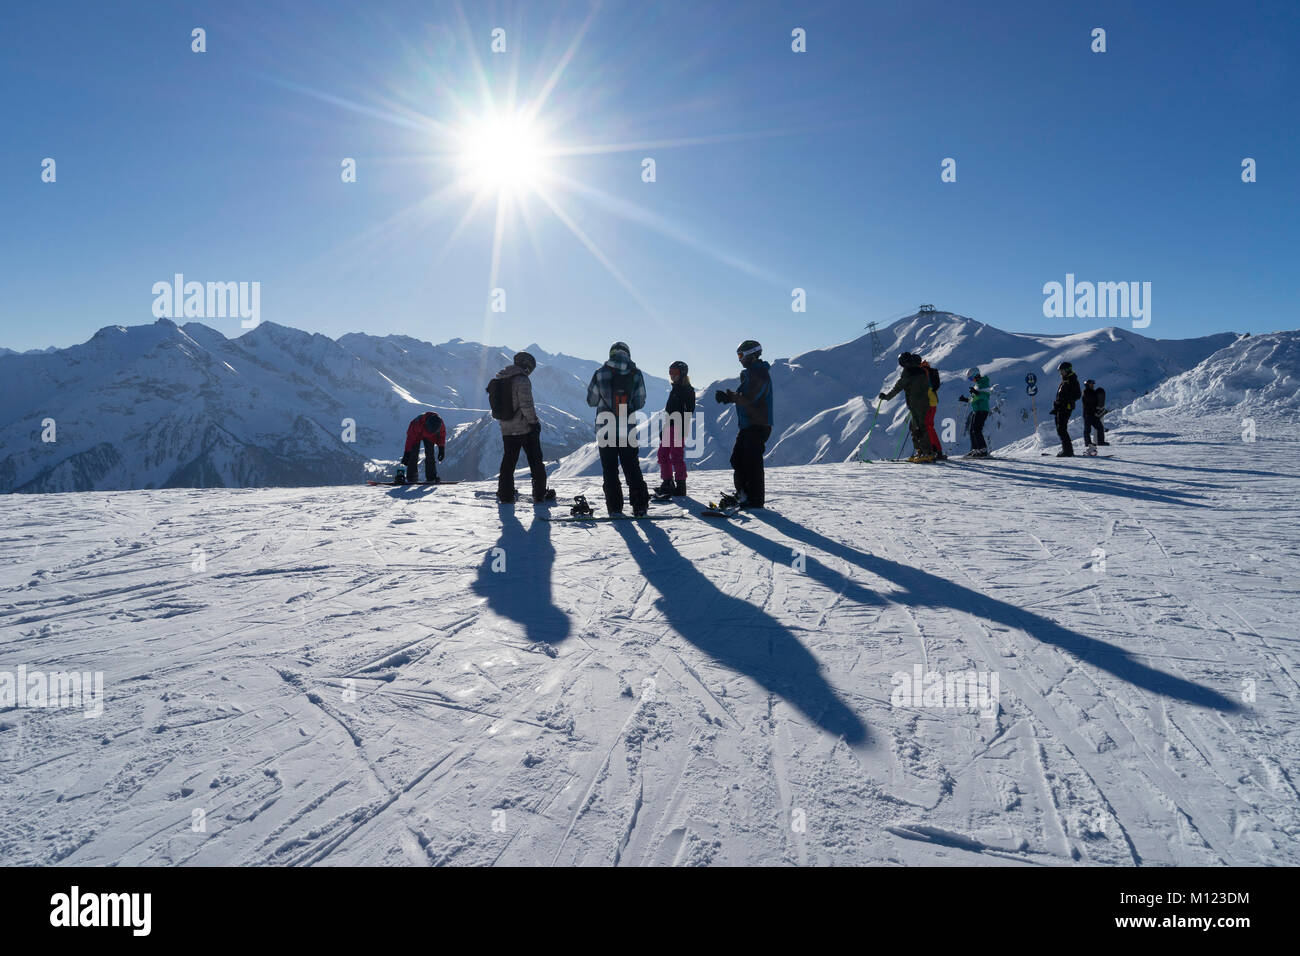 Skiers in the skiing area Penken Horberg,Mayrhofen,Zillertal,Tyrol,Austria - Stock Image